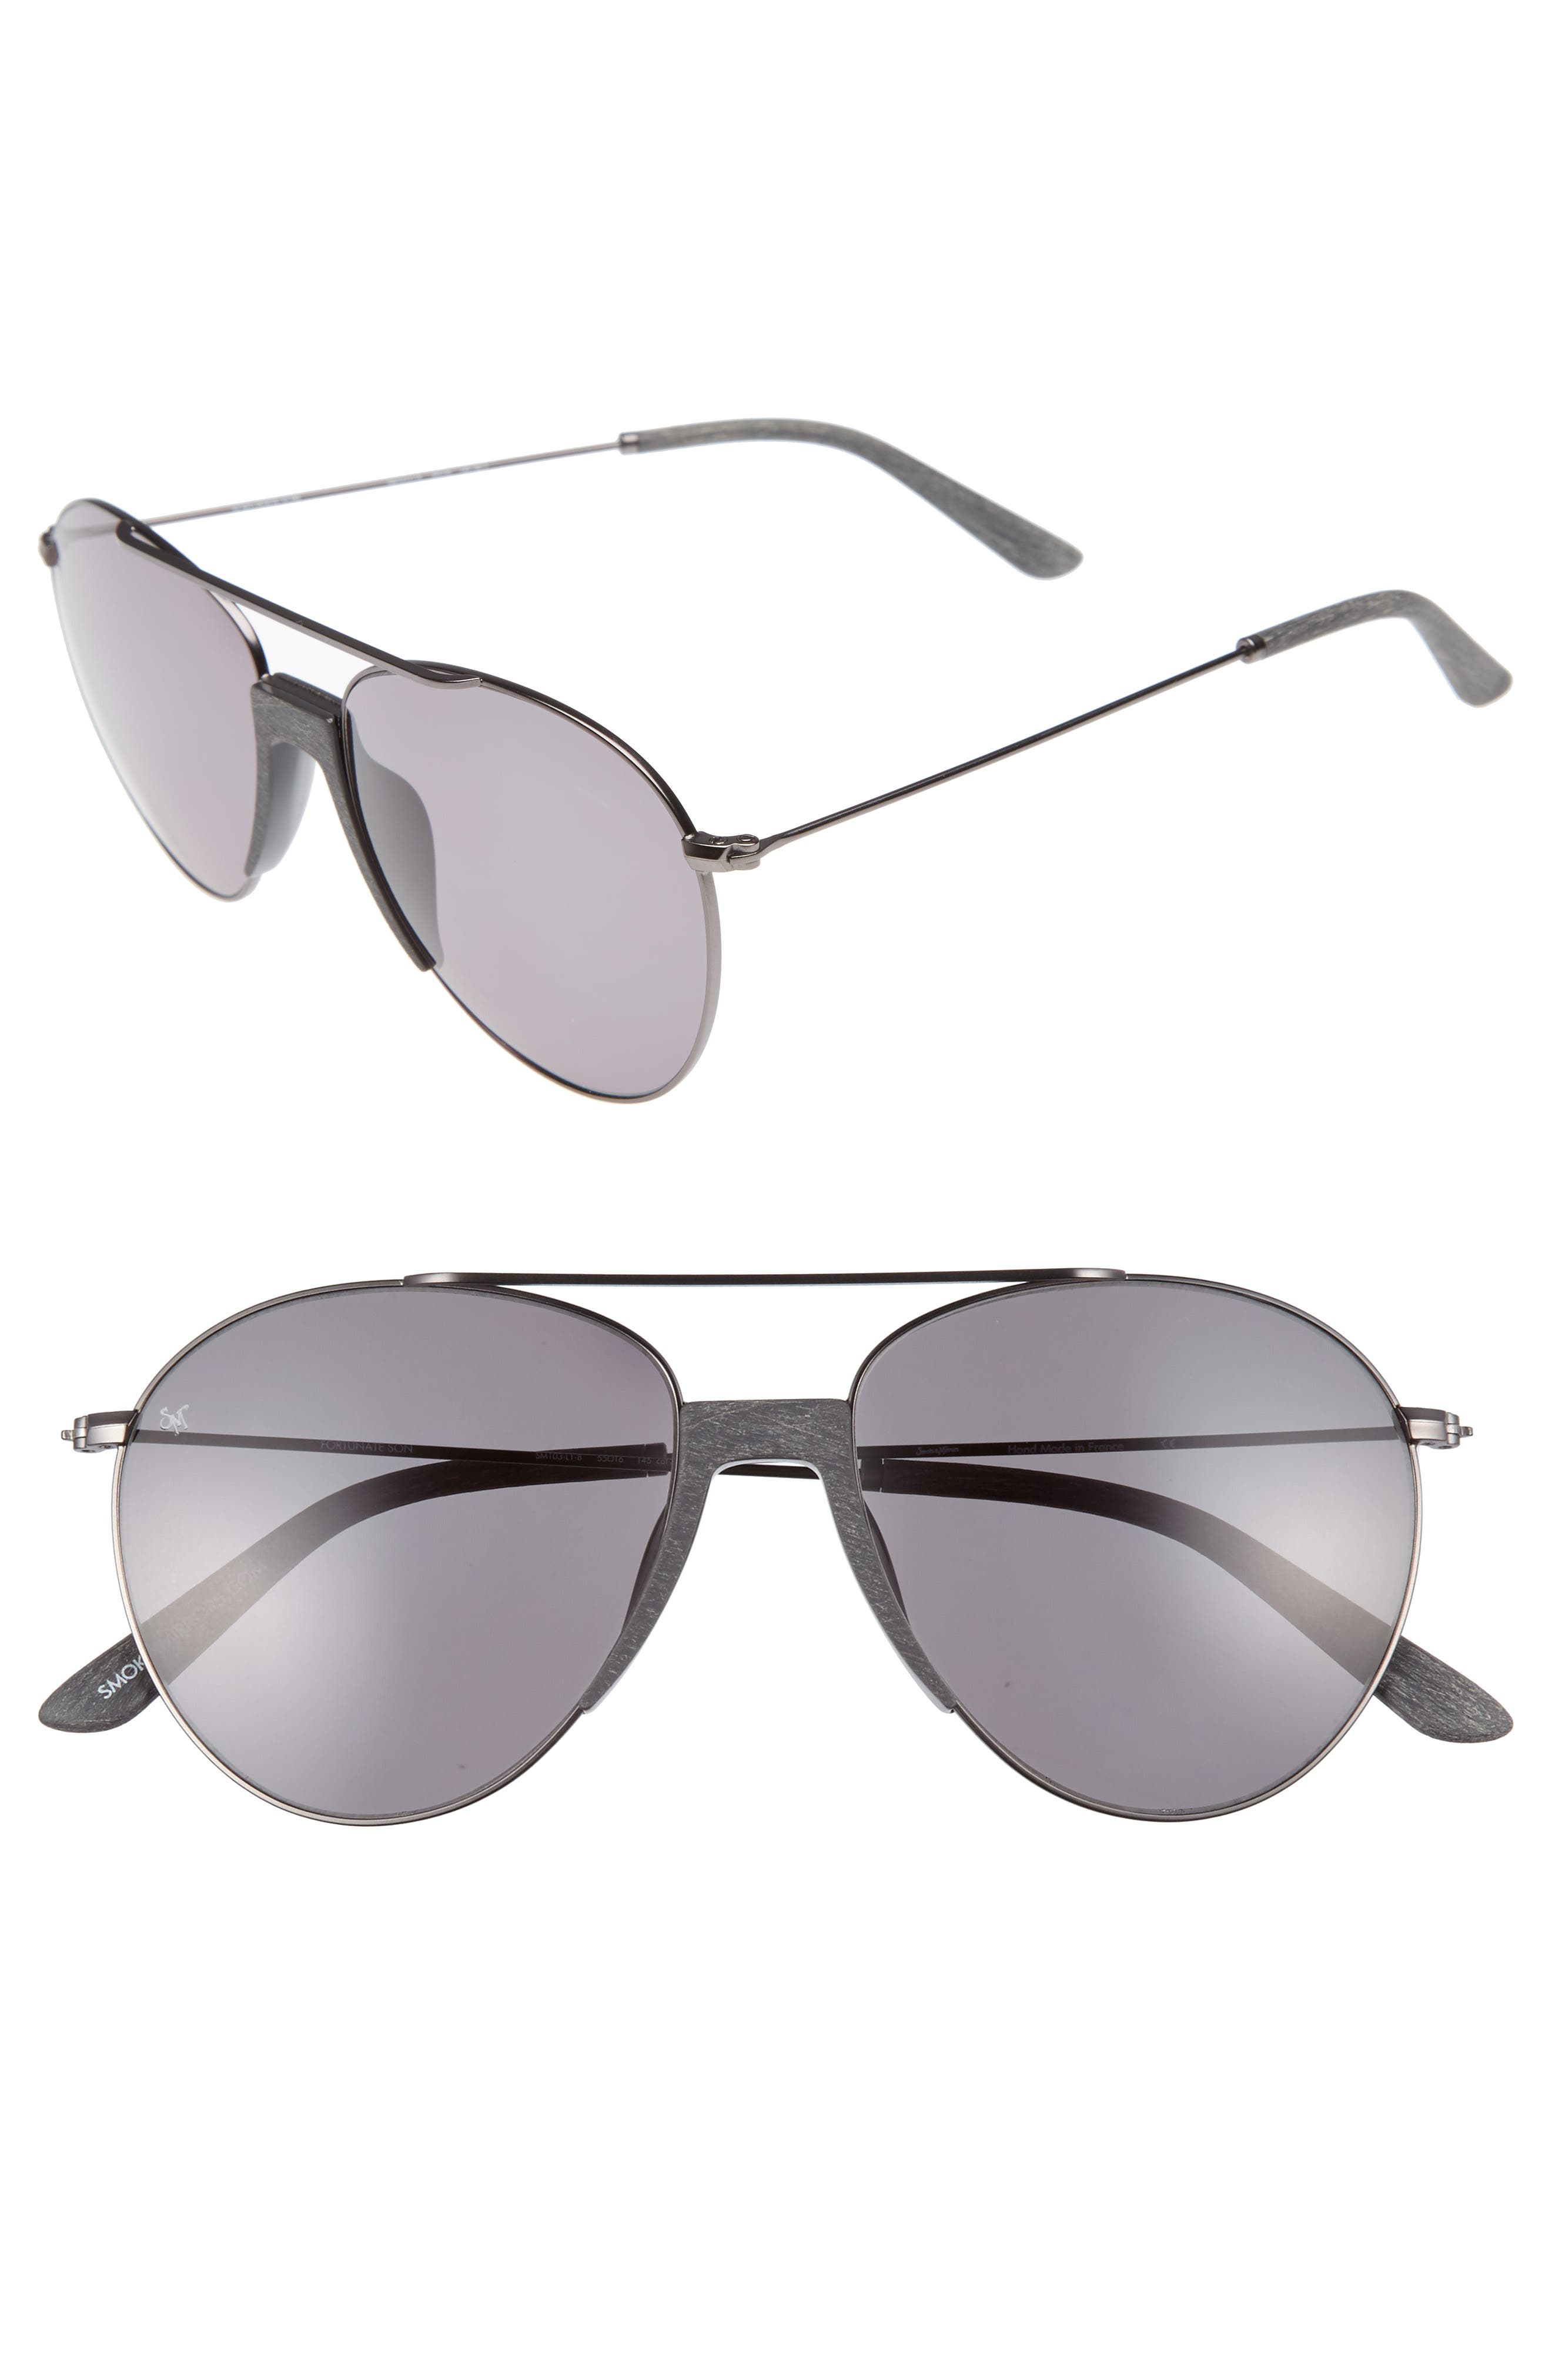 Fortunate Son 55mm Gradient Lens Aviator Sunglasses,                             Main thumbnail 1, color,                             020